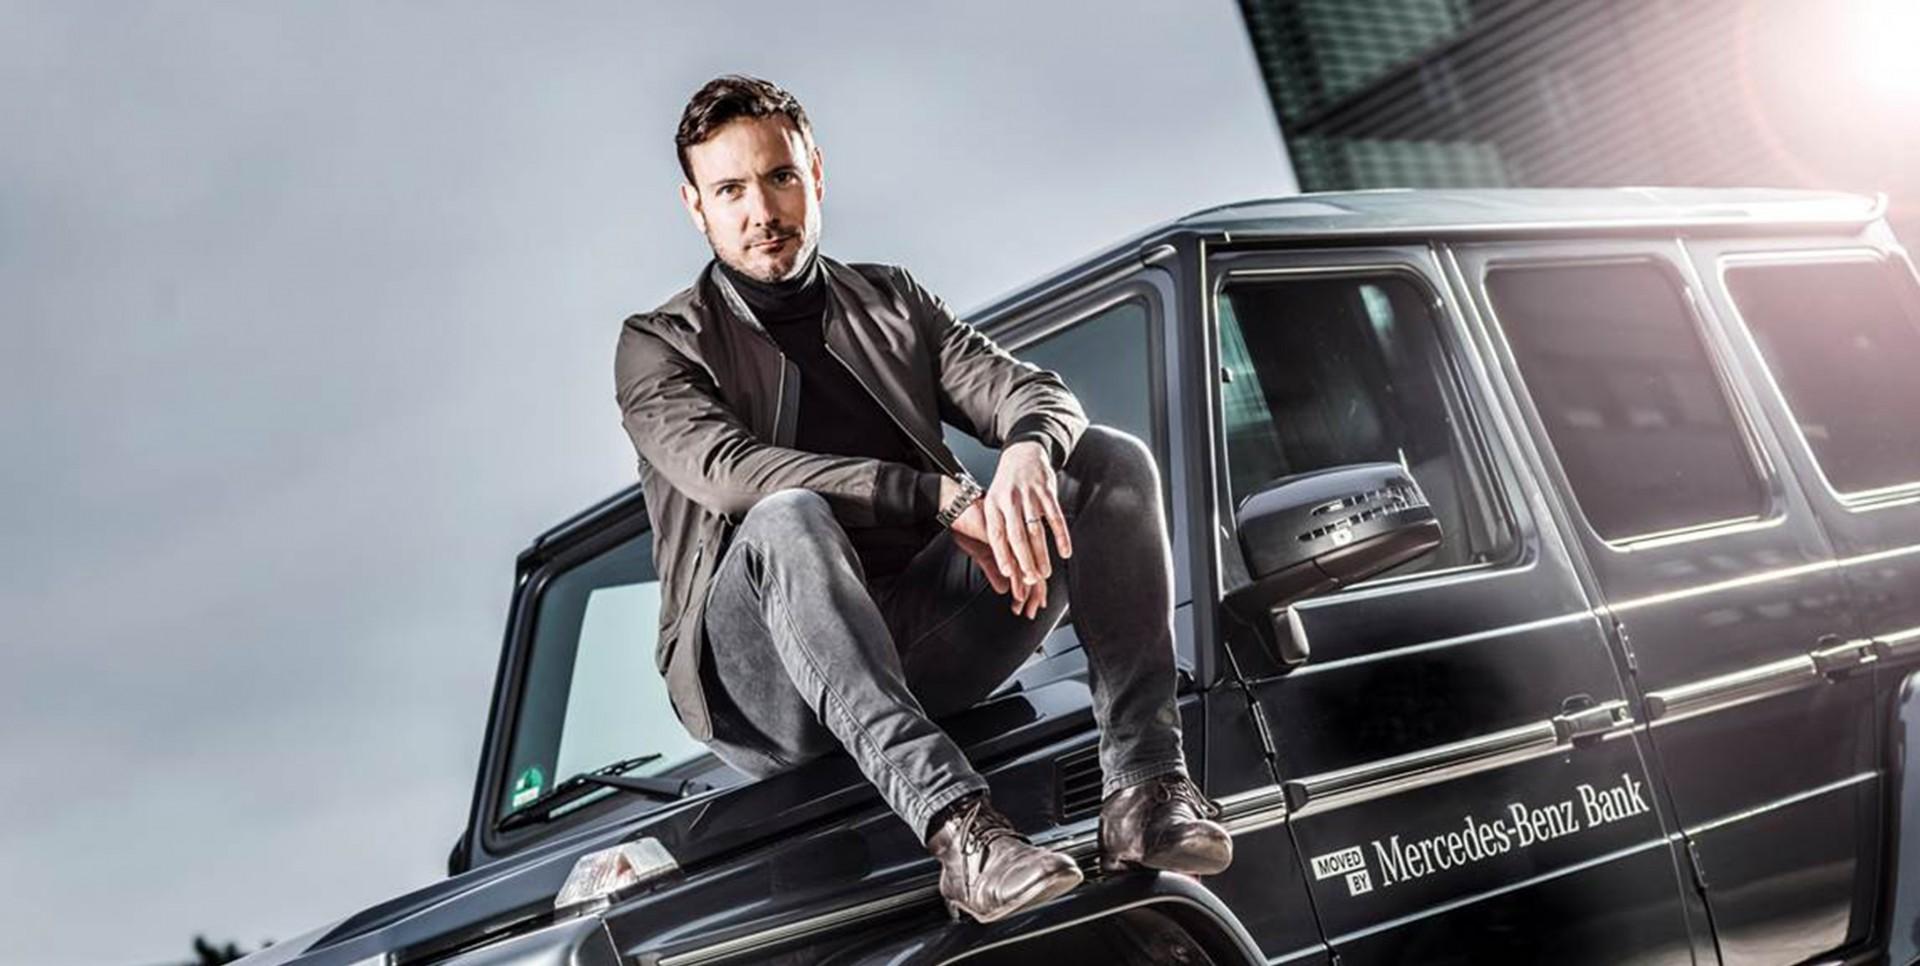 Eric Gauthier Ist Markenbotschafter Der Mercedes Benz Bank